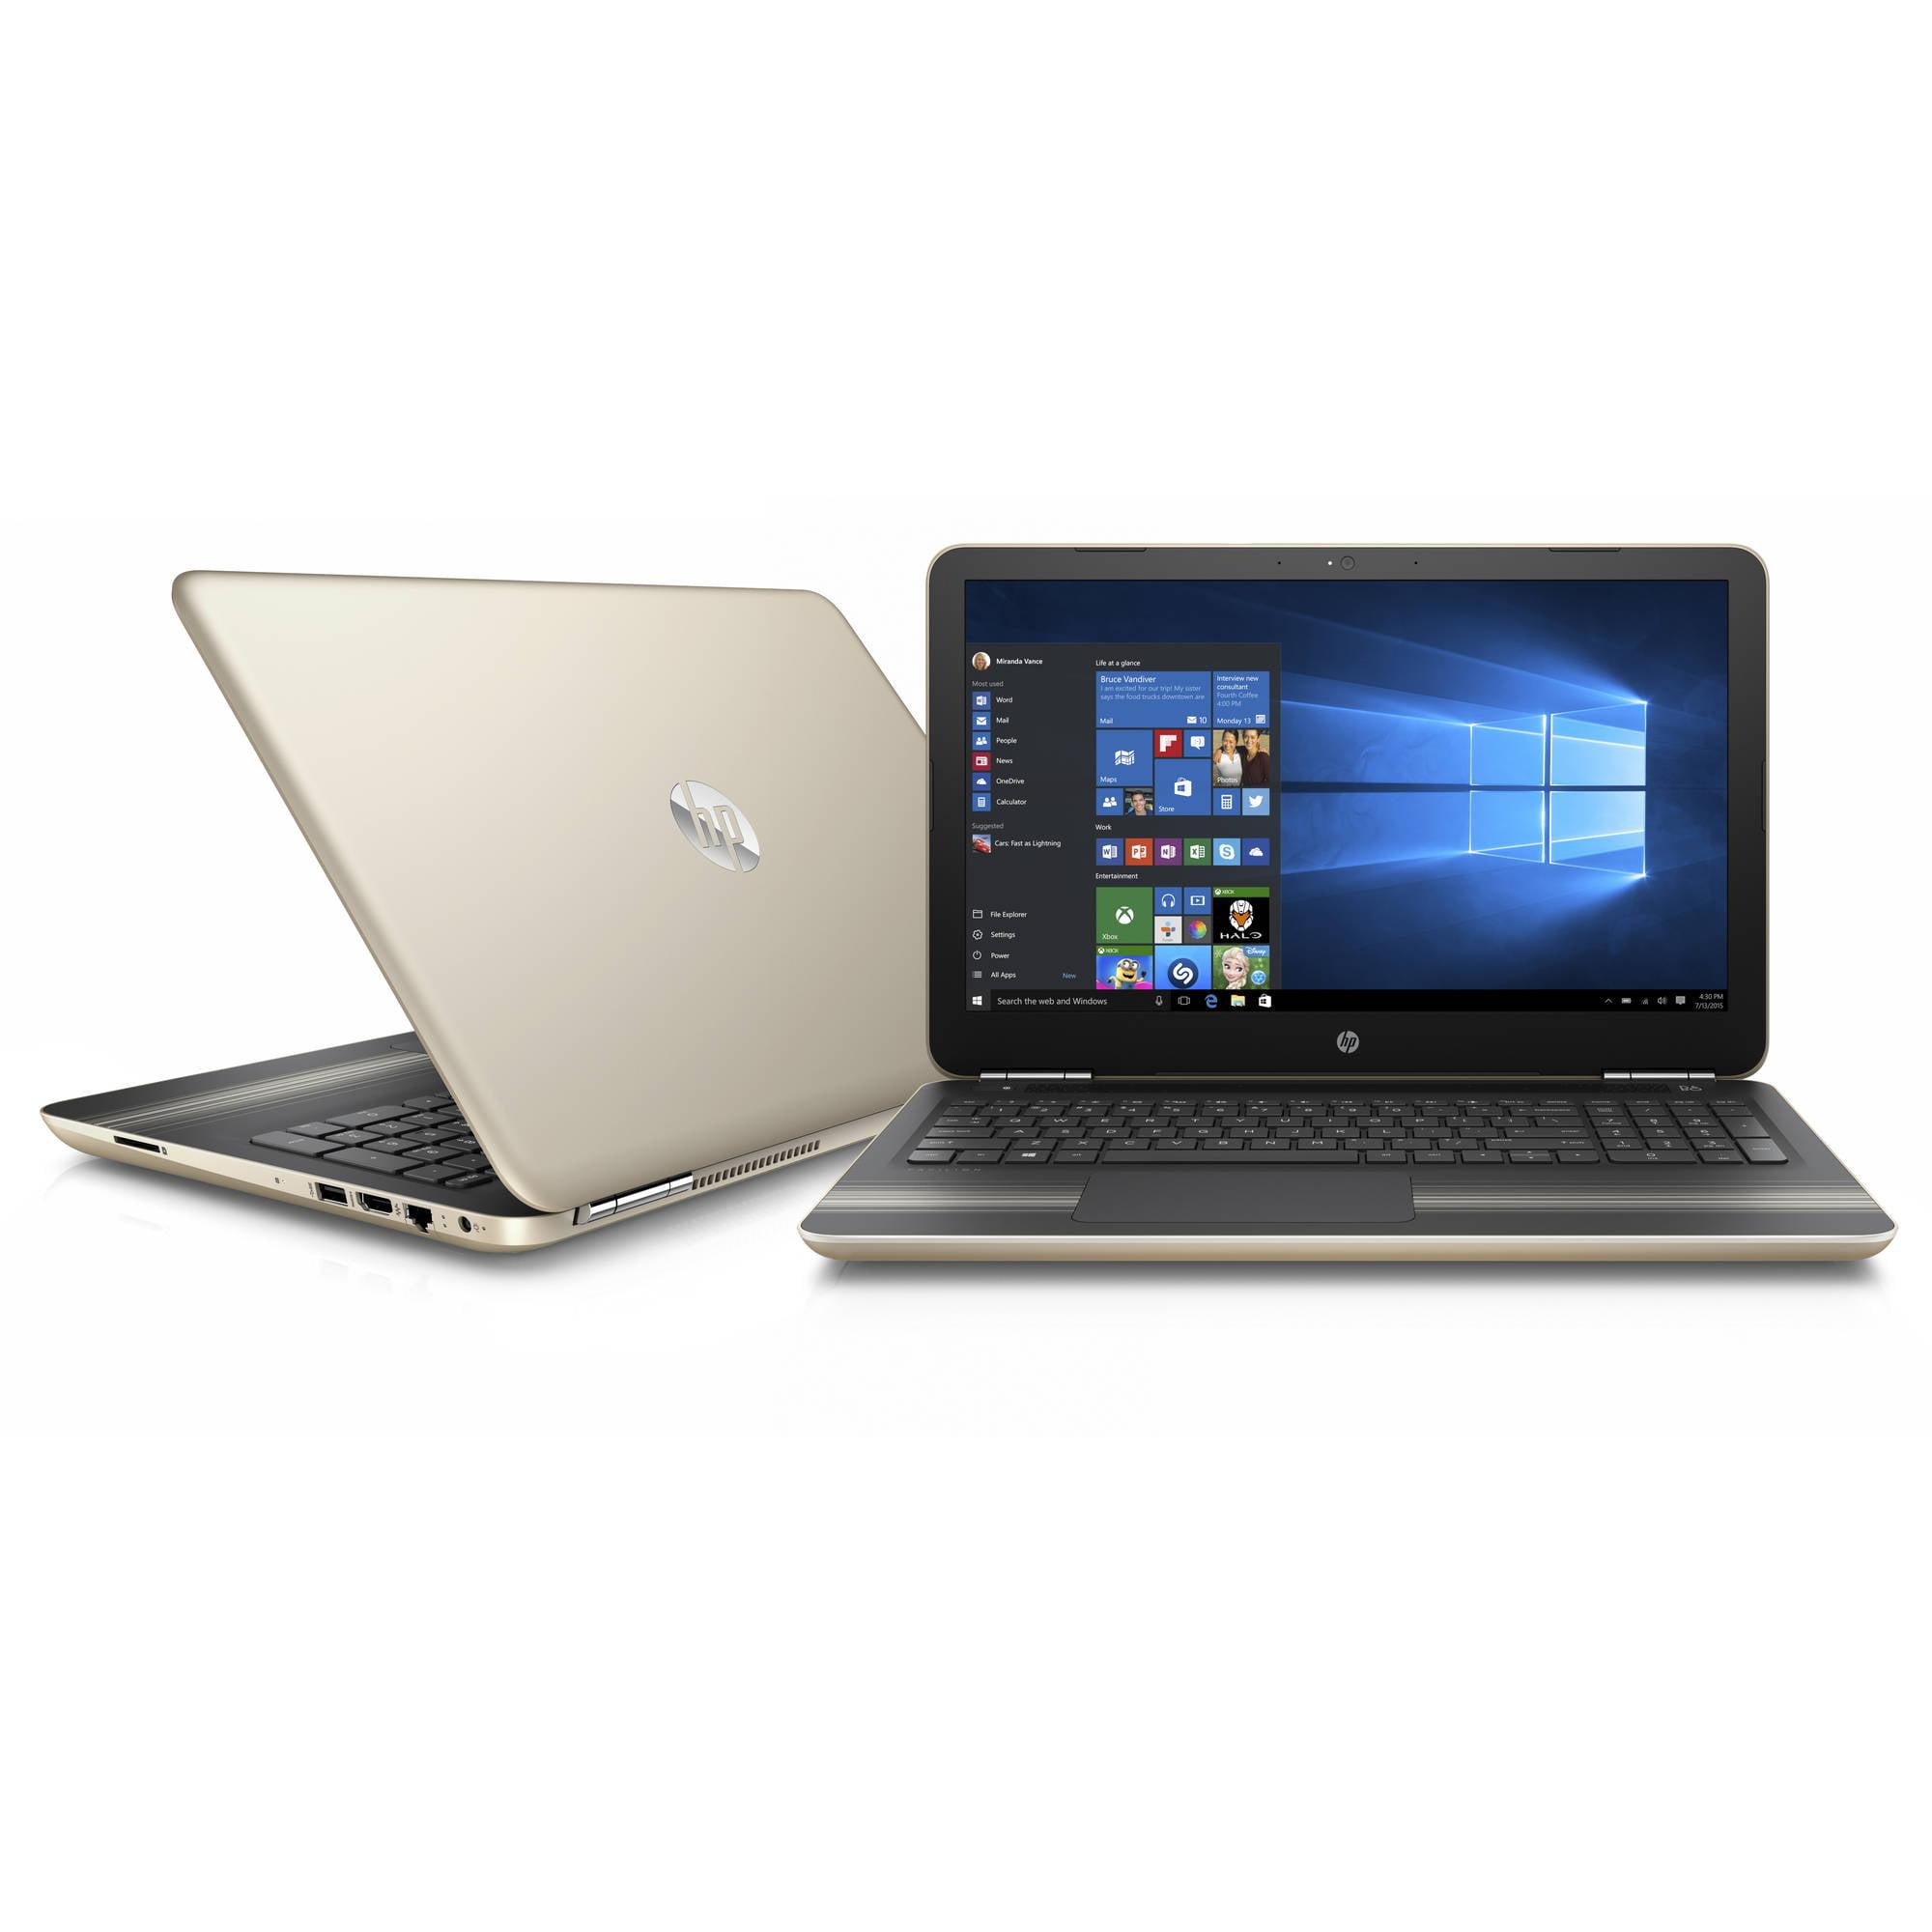 "HP Pavilion 15-au020wm 15.6"" Manhattan Gold Laptop, Windows 10, Intel Core i5-6200U Processor, 8GB Memory, 1TB Hard Drive"